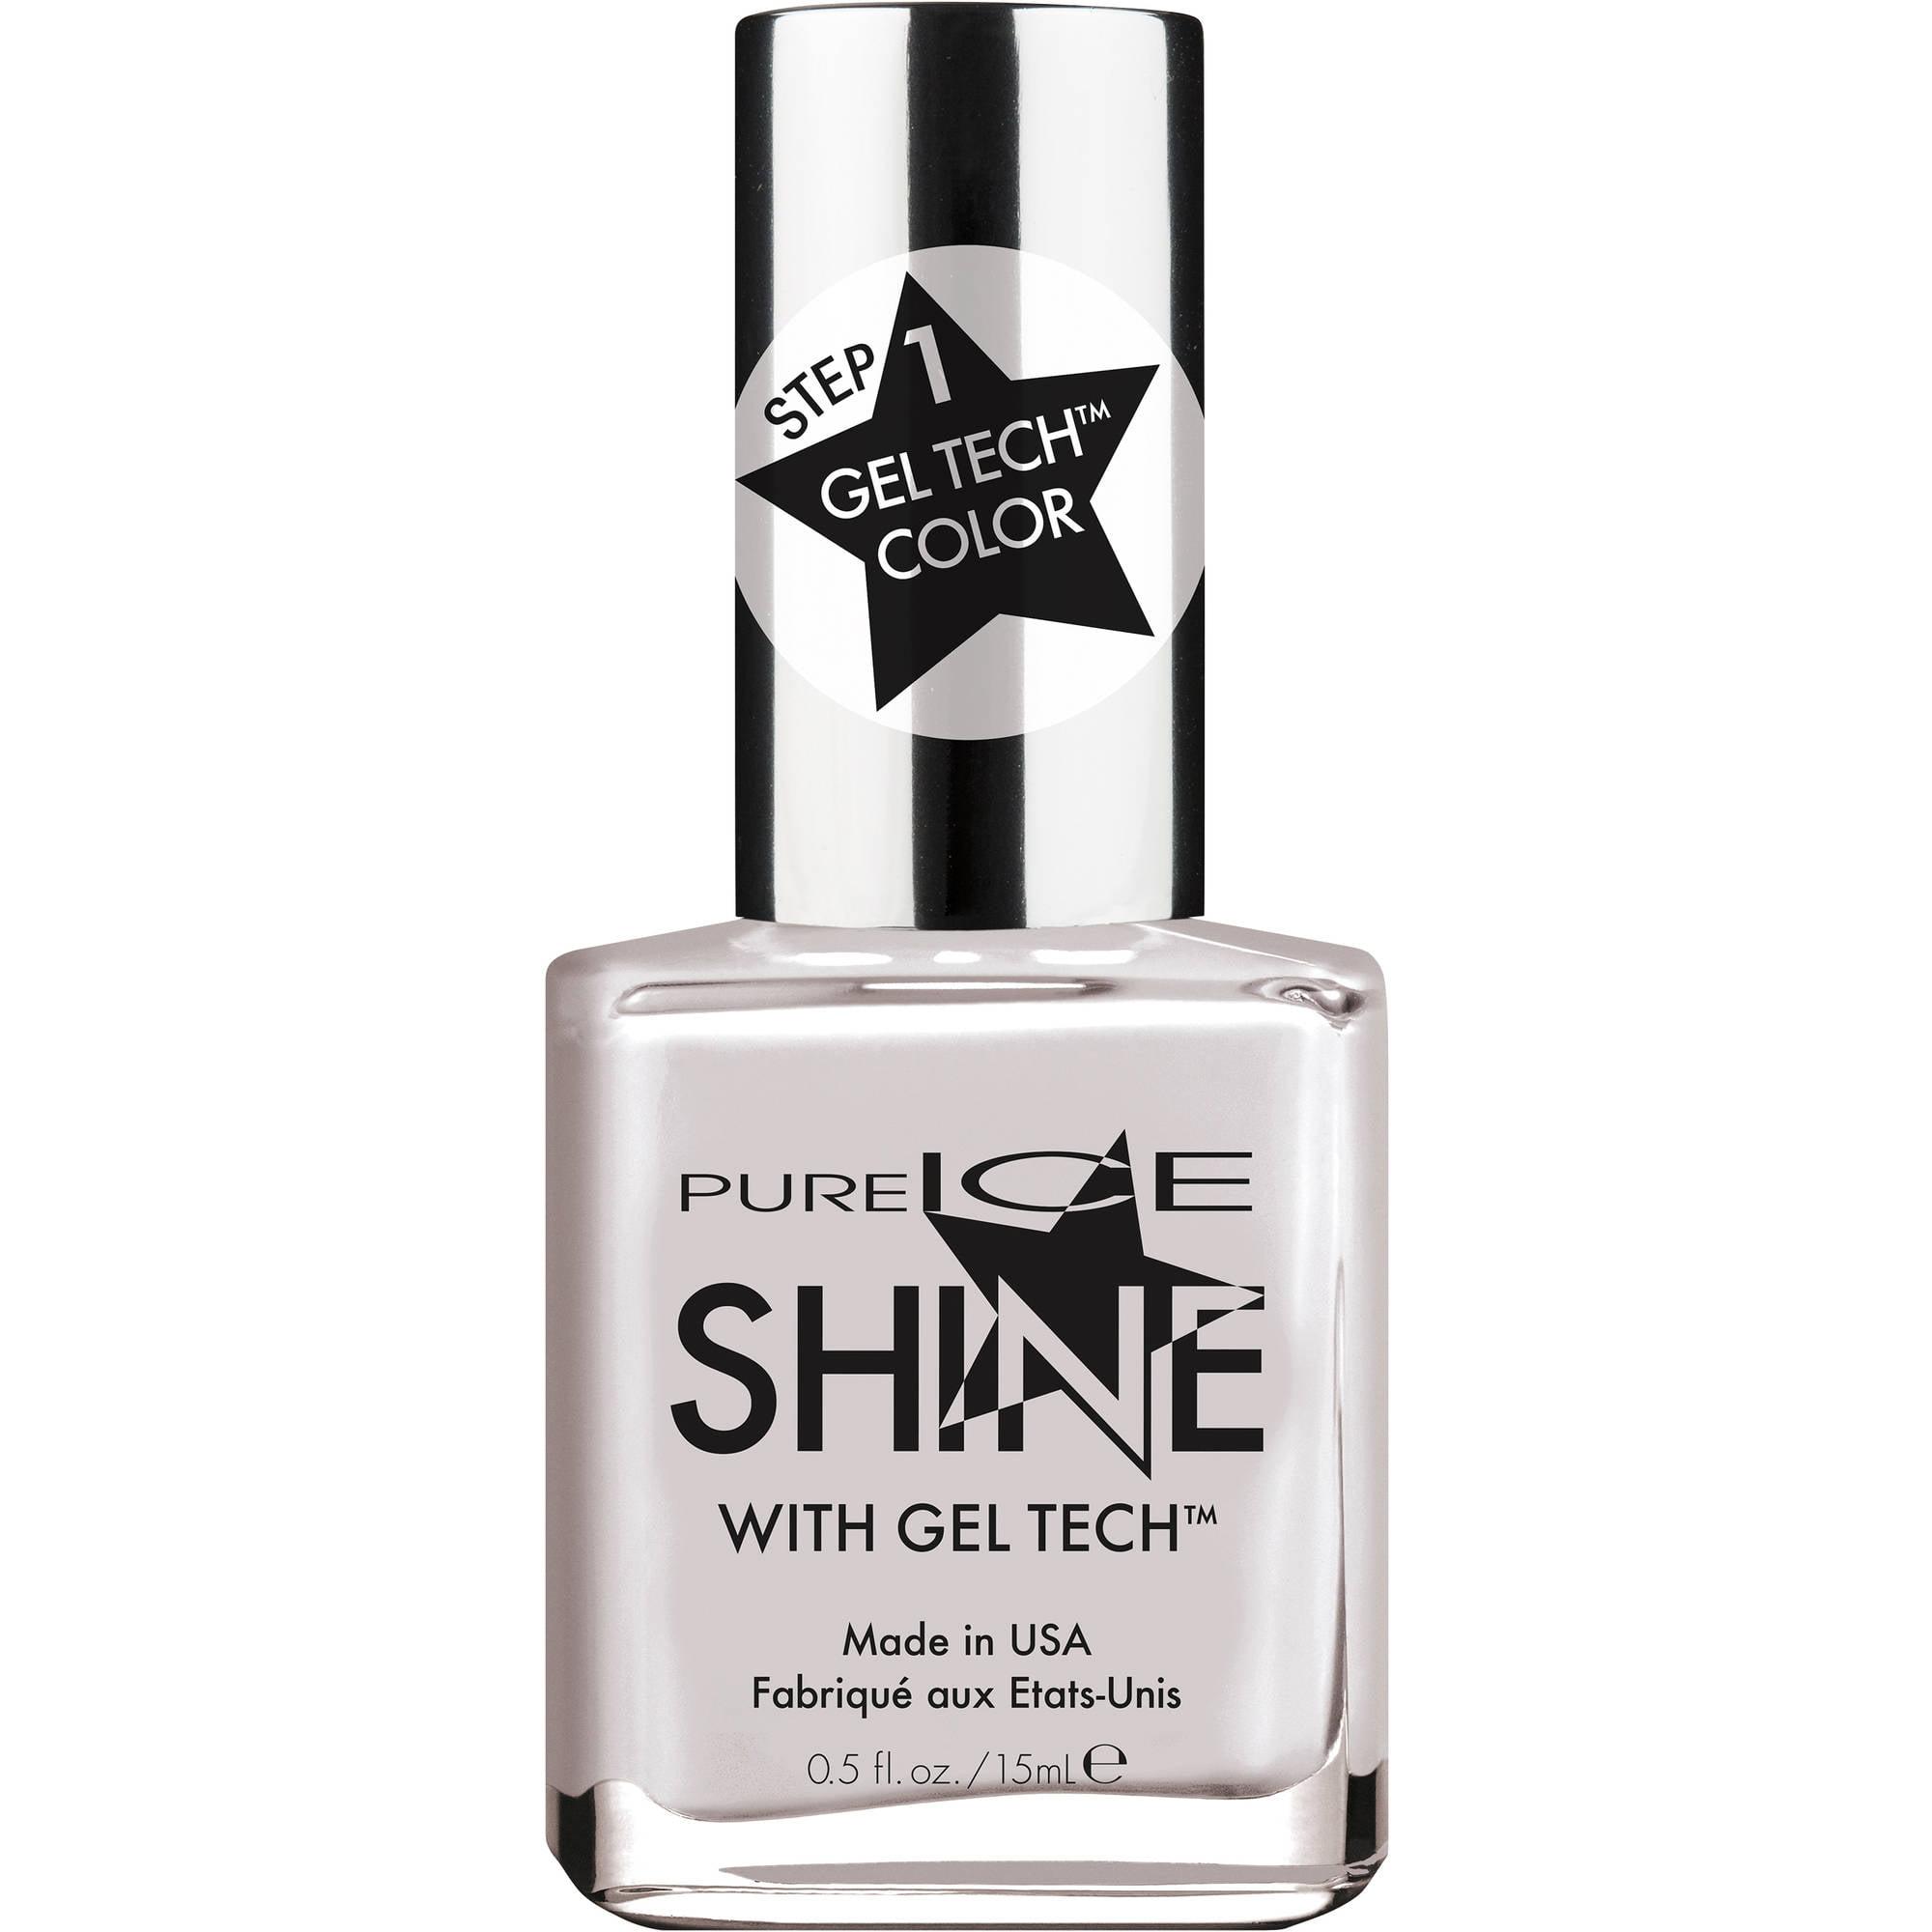 Pure Ice Shine with Gel Tech Nail Polish, He Rocks My World, 0.5 fl oz